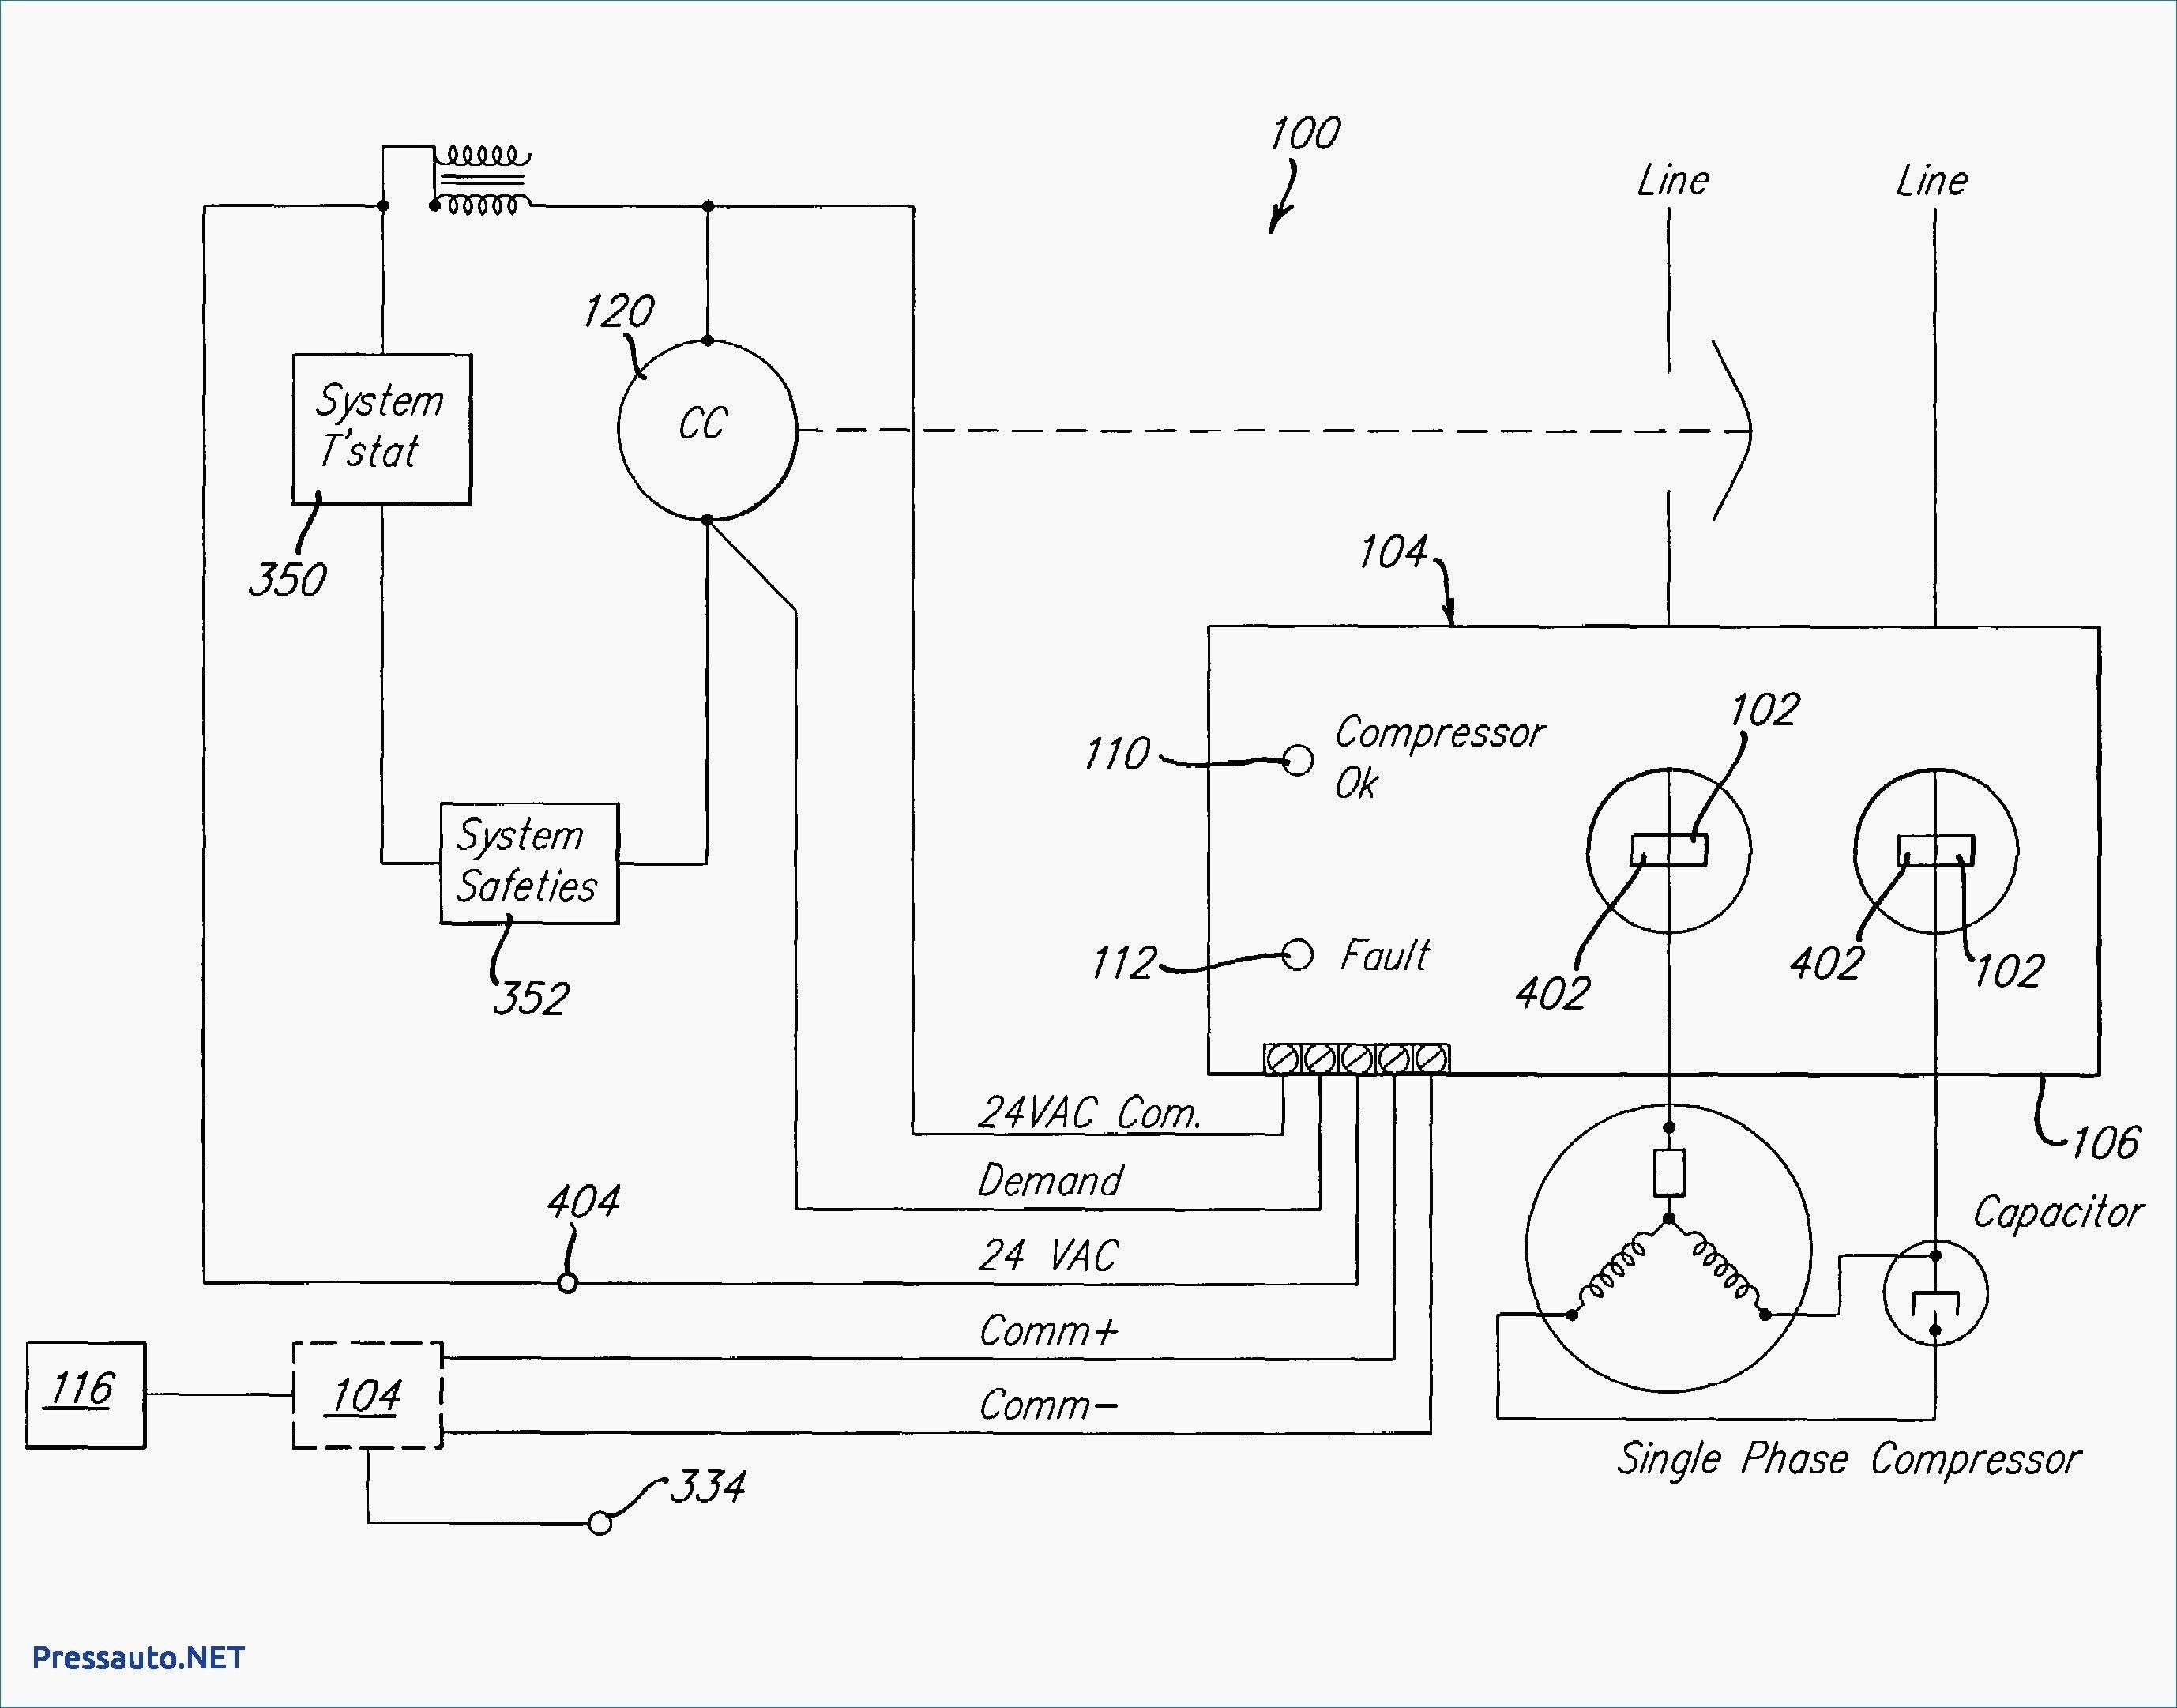 Condensing Fan Motor Wiring Diagram Awesome In 2020 Air Compressor Pressure Switch Ac Compressor Compressor